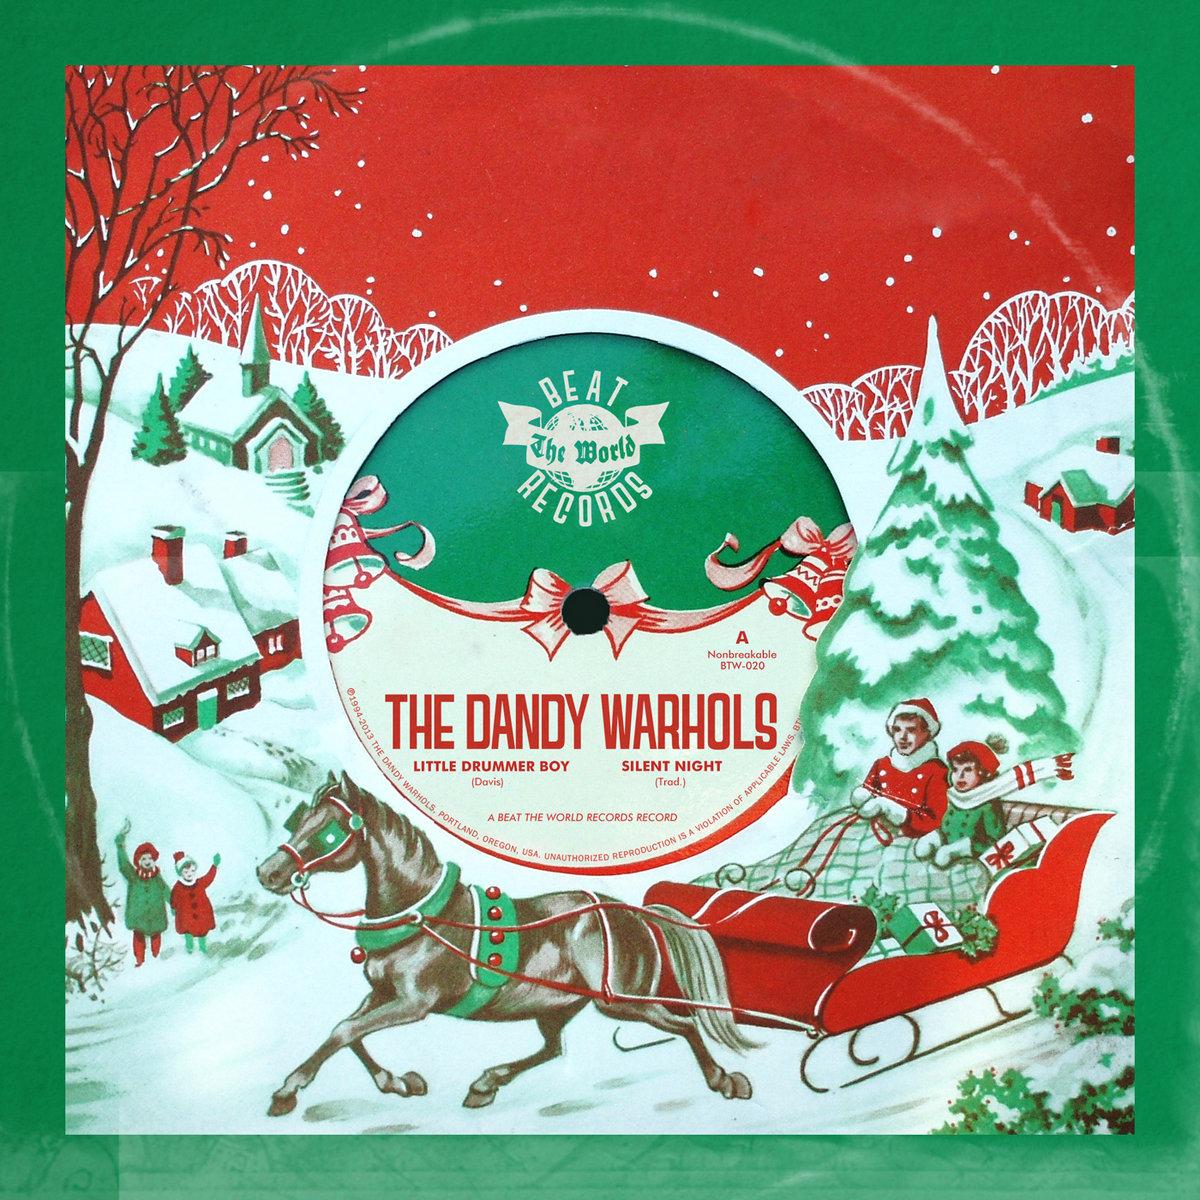 Christmas Drummer Boy.Little Drummer Boy Silent Night The Dandy Warhols